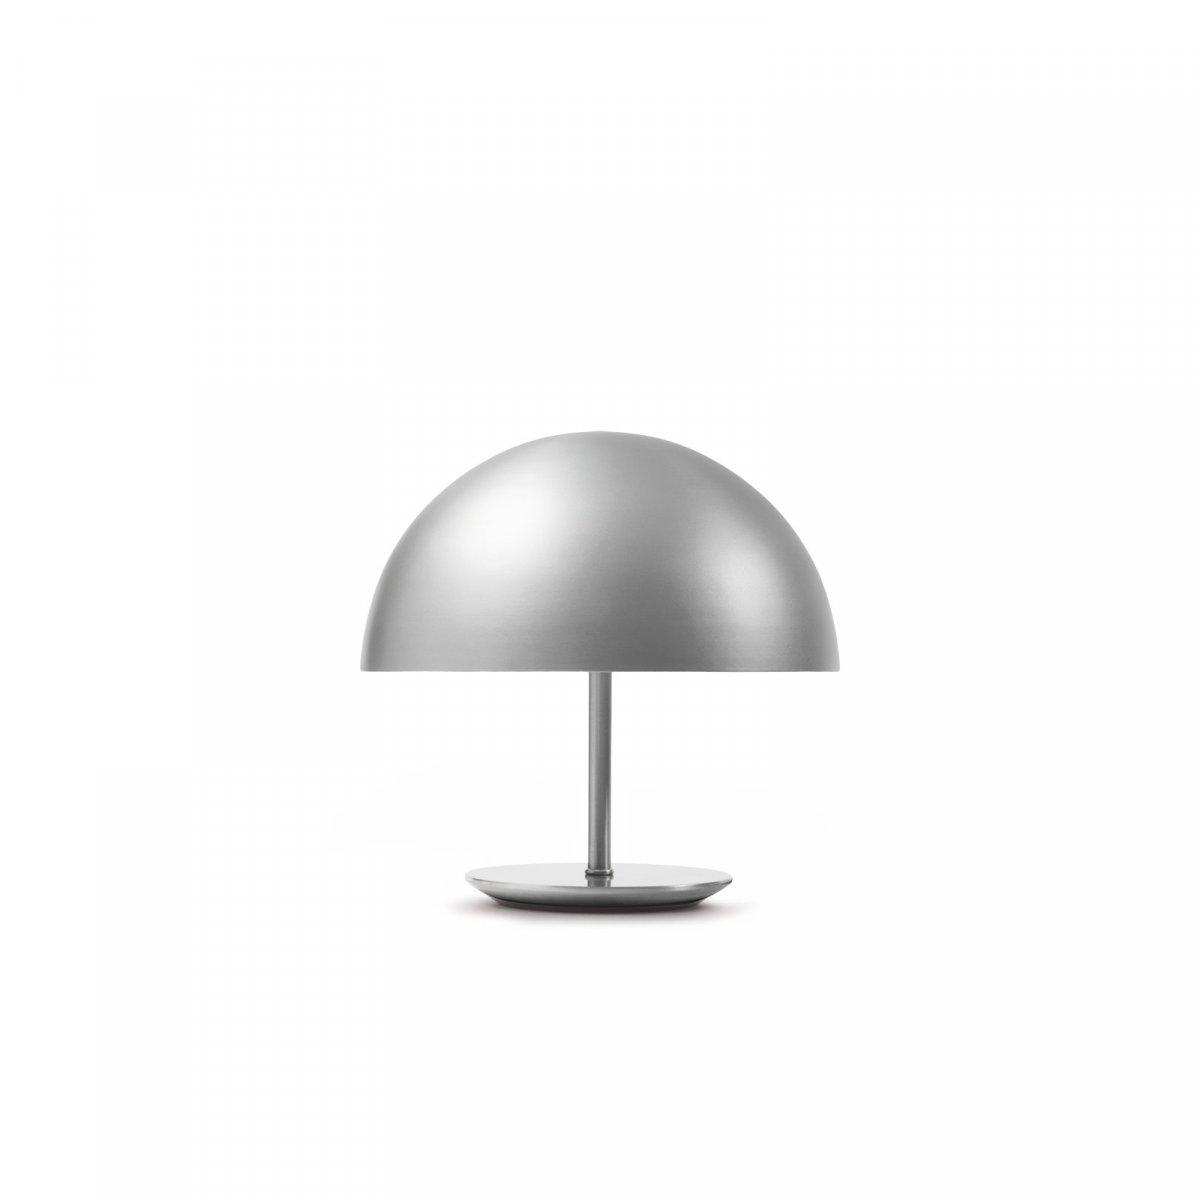 Baby Dome Lamp, matte aluminum.